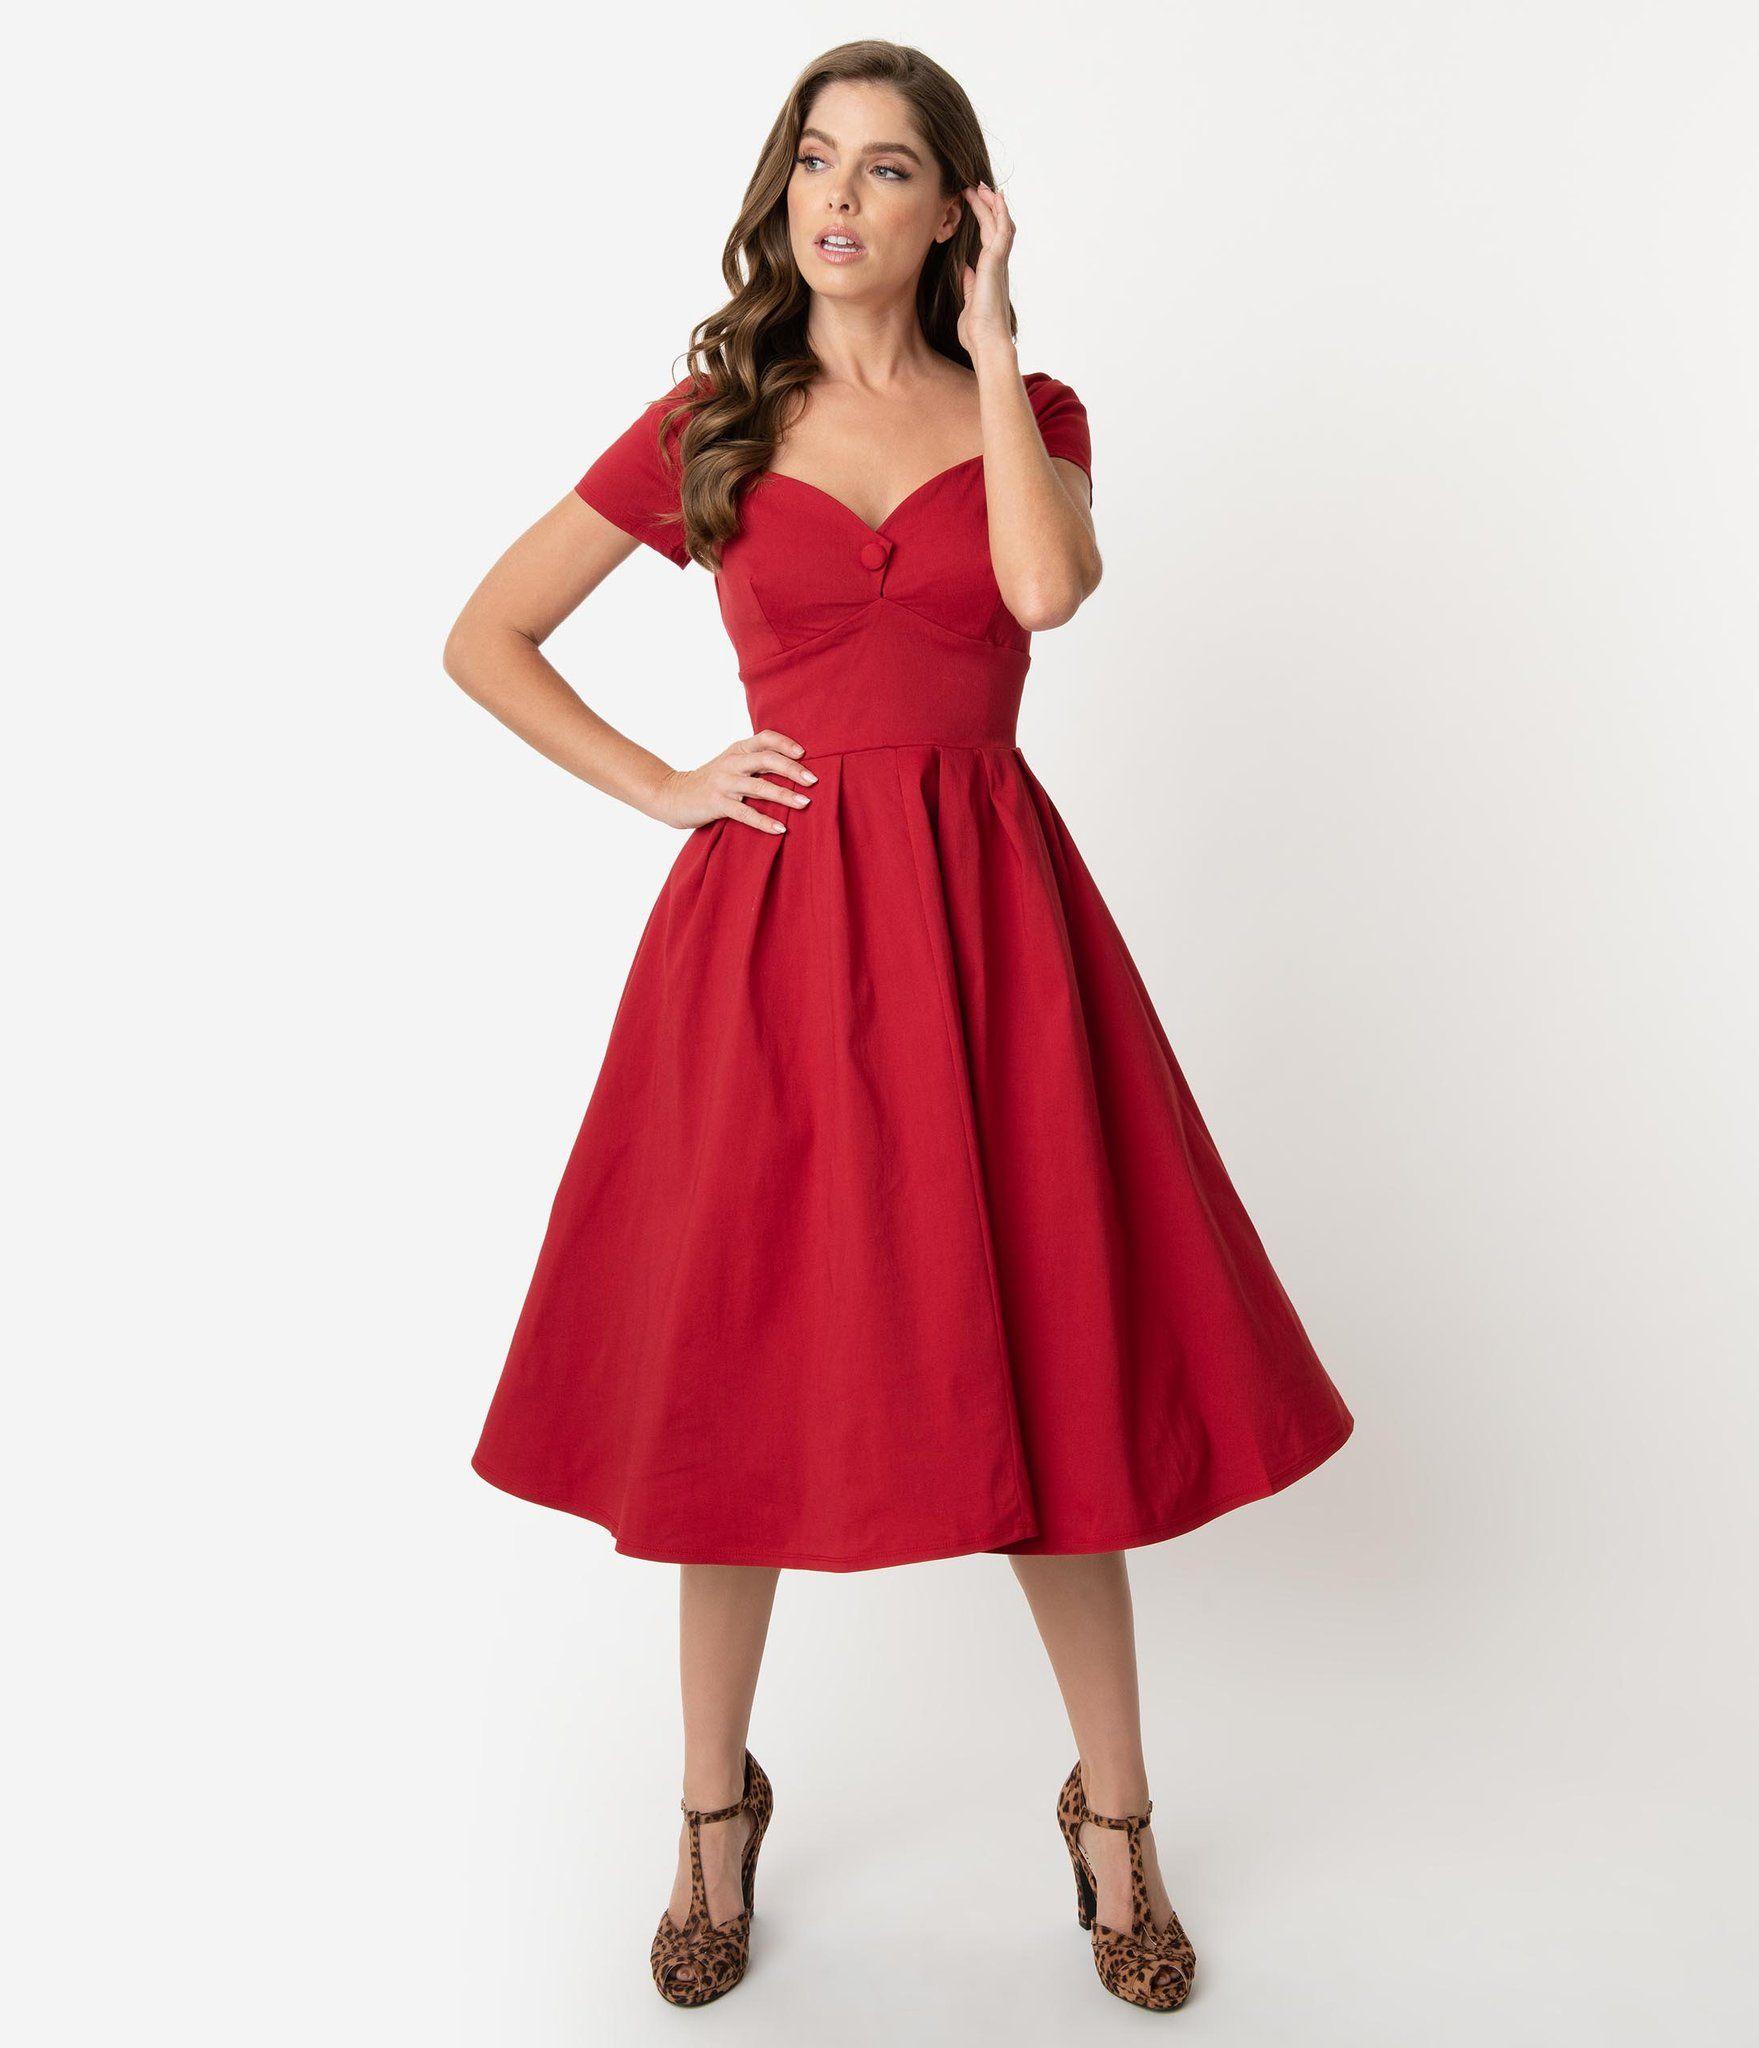 Unique Vintage 1950s Red Sweetheart Midge Swing Dress Vintage Red Dress Swing Dress Vintage Dresses [ 2048 x 1759 Pixel ]